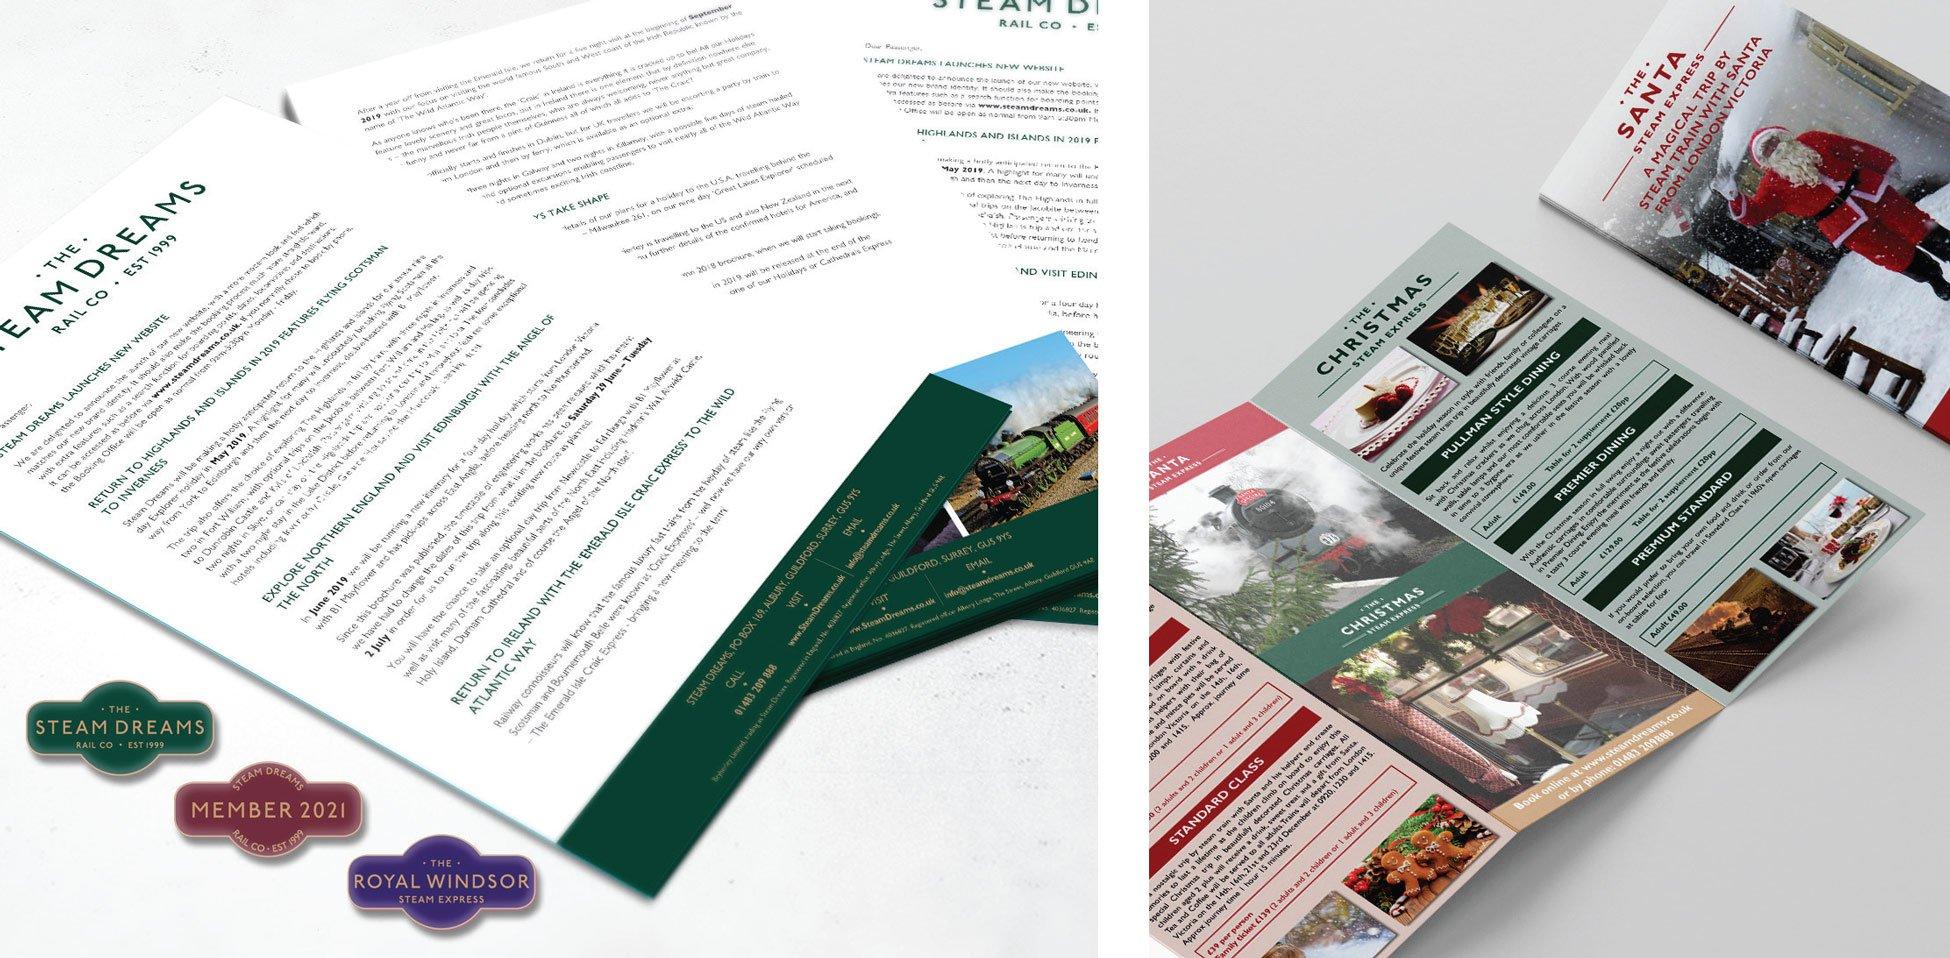 Steam Dreams - Leaflets Design & Print